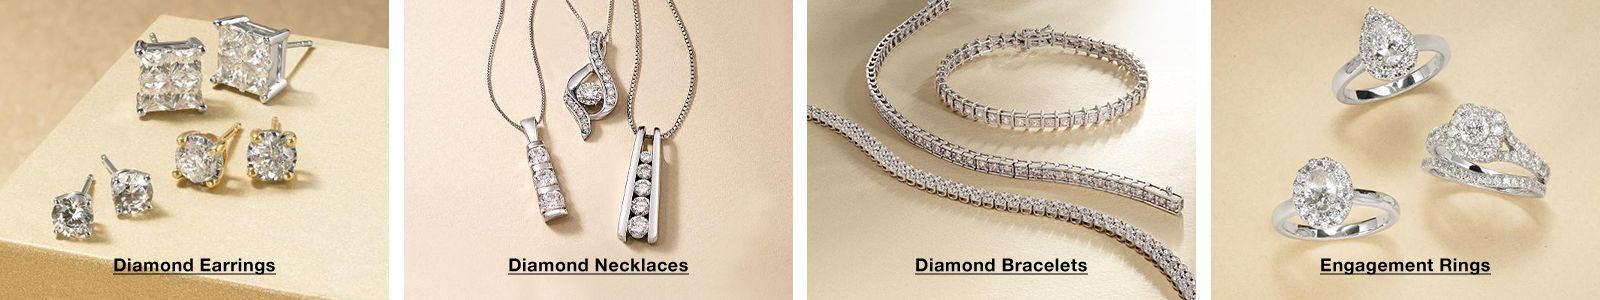 Diamond Earrings, Diamond Necklaces, Diamond Bracelets, Engagement Rings